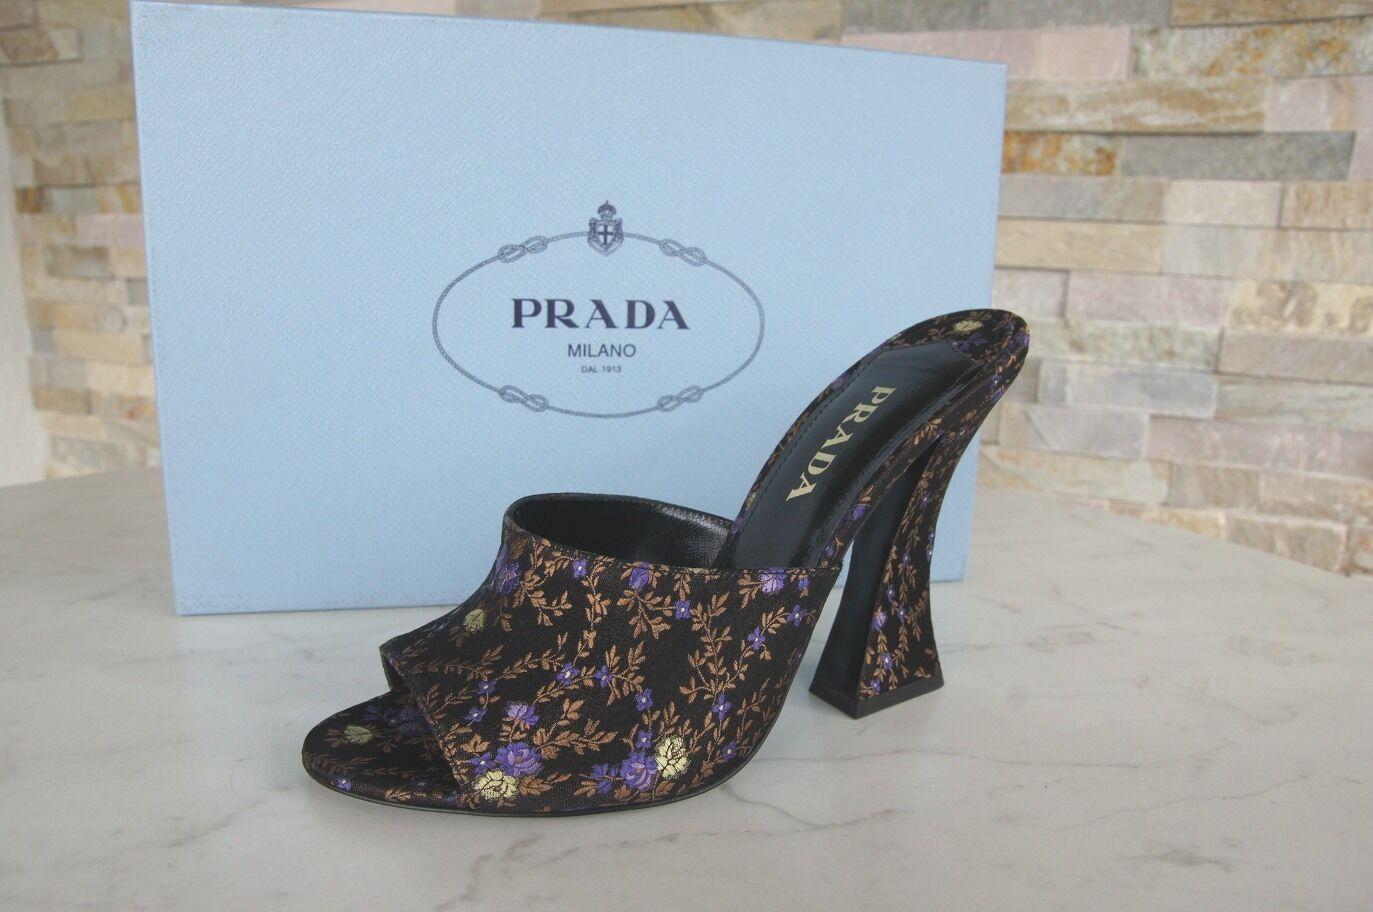 PRADA Heels Gr 37,5 Pantoletten Sandaletten Heels PRADA Schuhe schwarz floral NEU 34599b